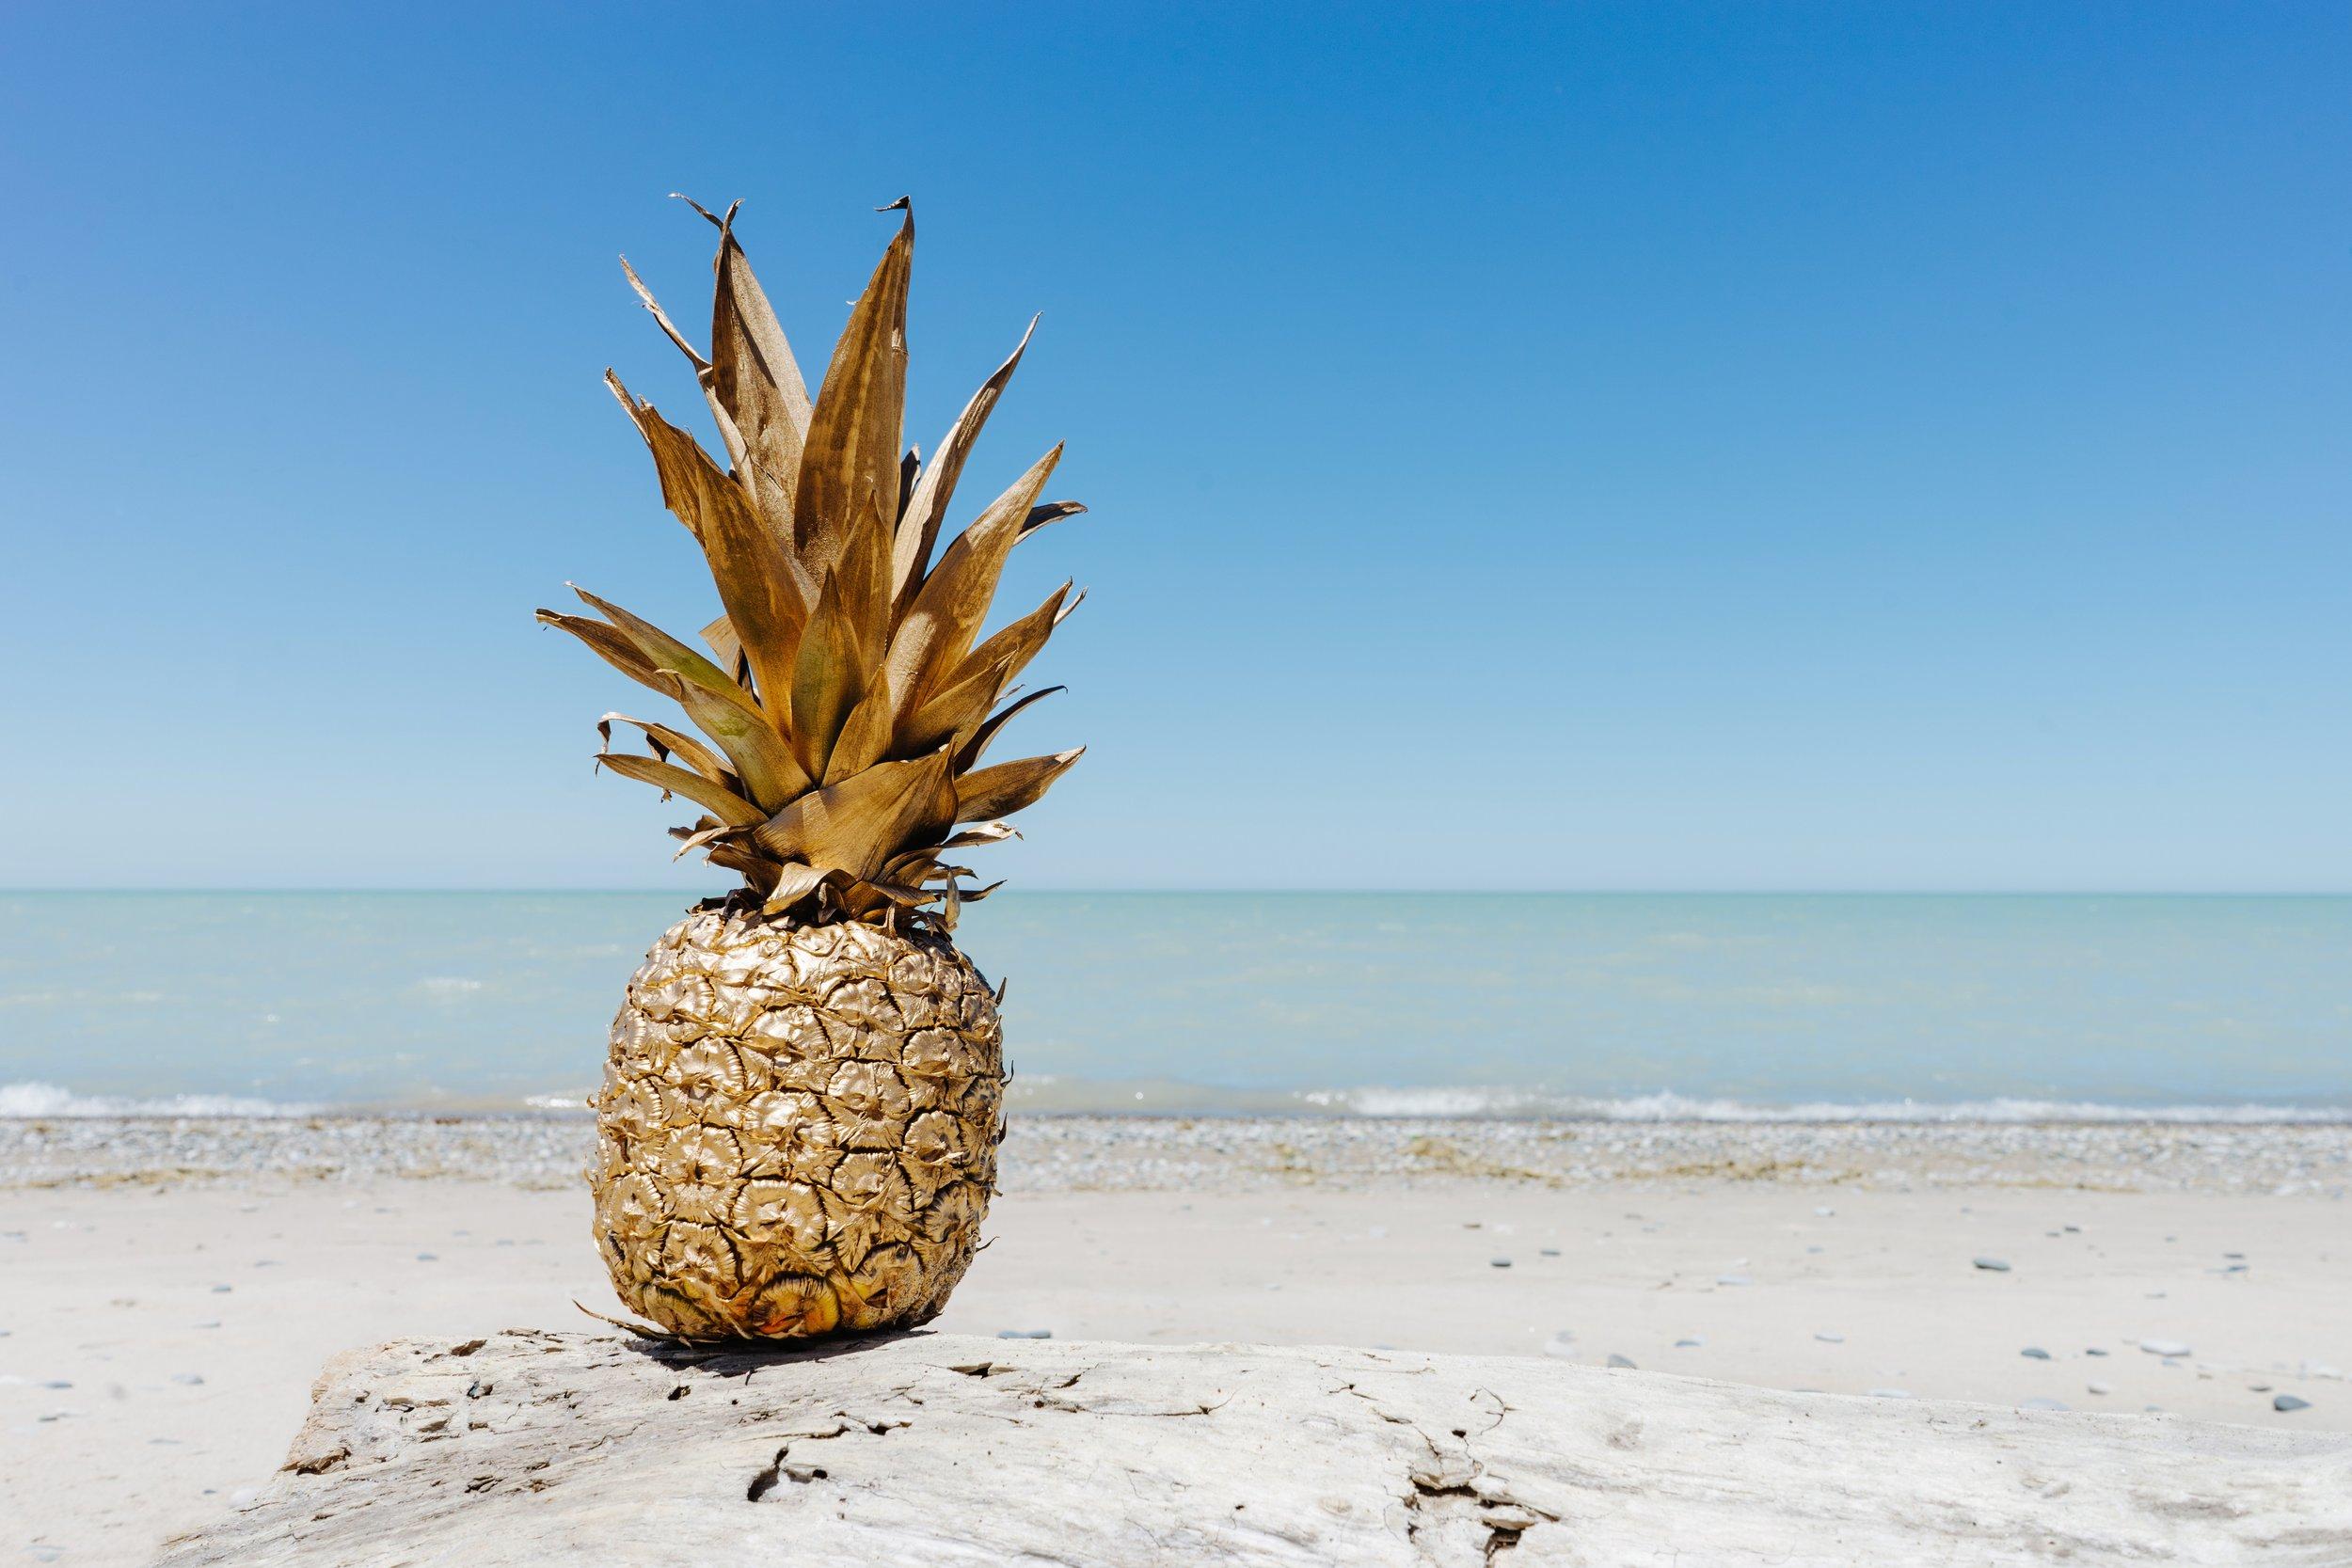 pineapple-supply-co-244487-unsplash.jpg